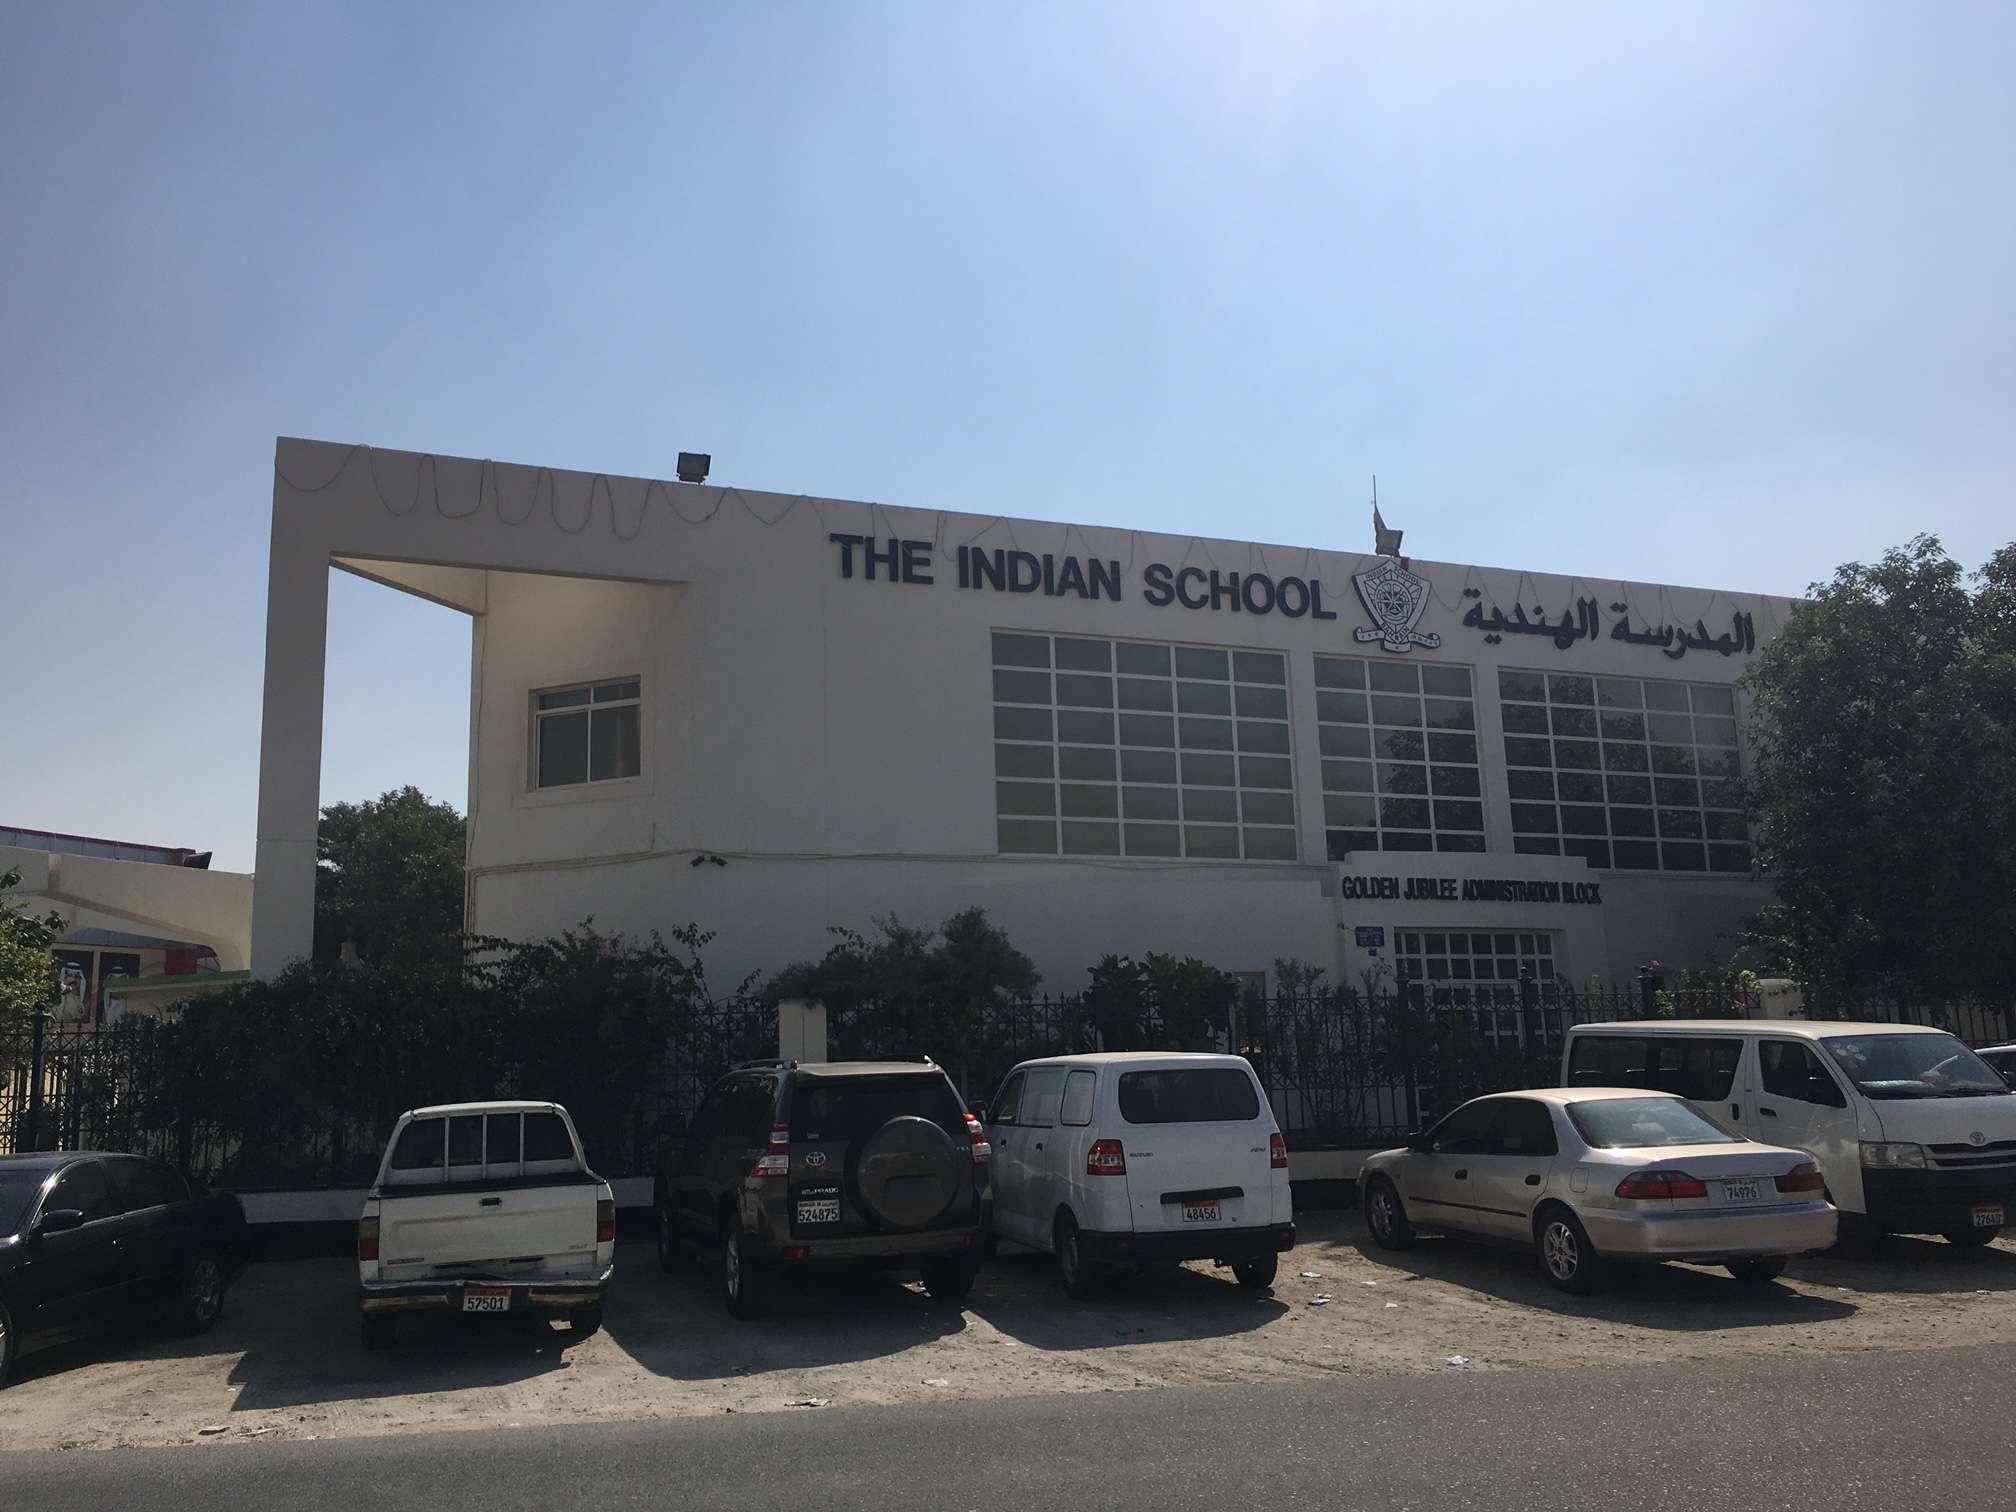 THE INDIAN SCHOOL PO BOX 558 ISA TOWN STATE OF BAHRAIN ARABIAN GULF 5230001